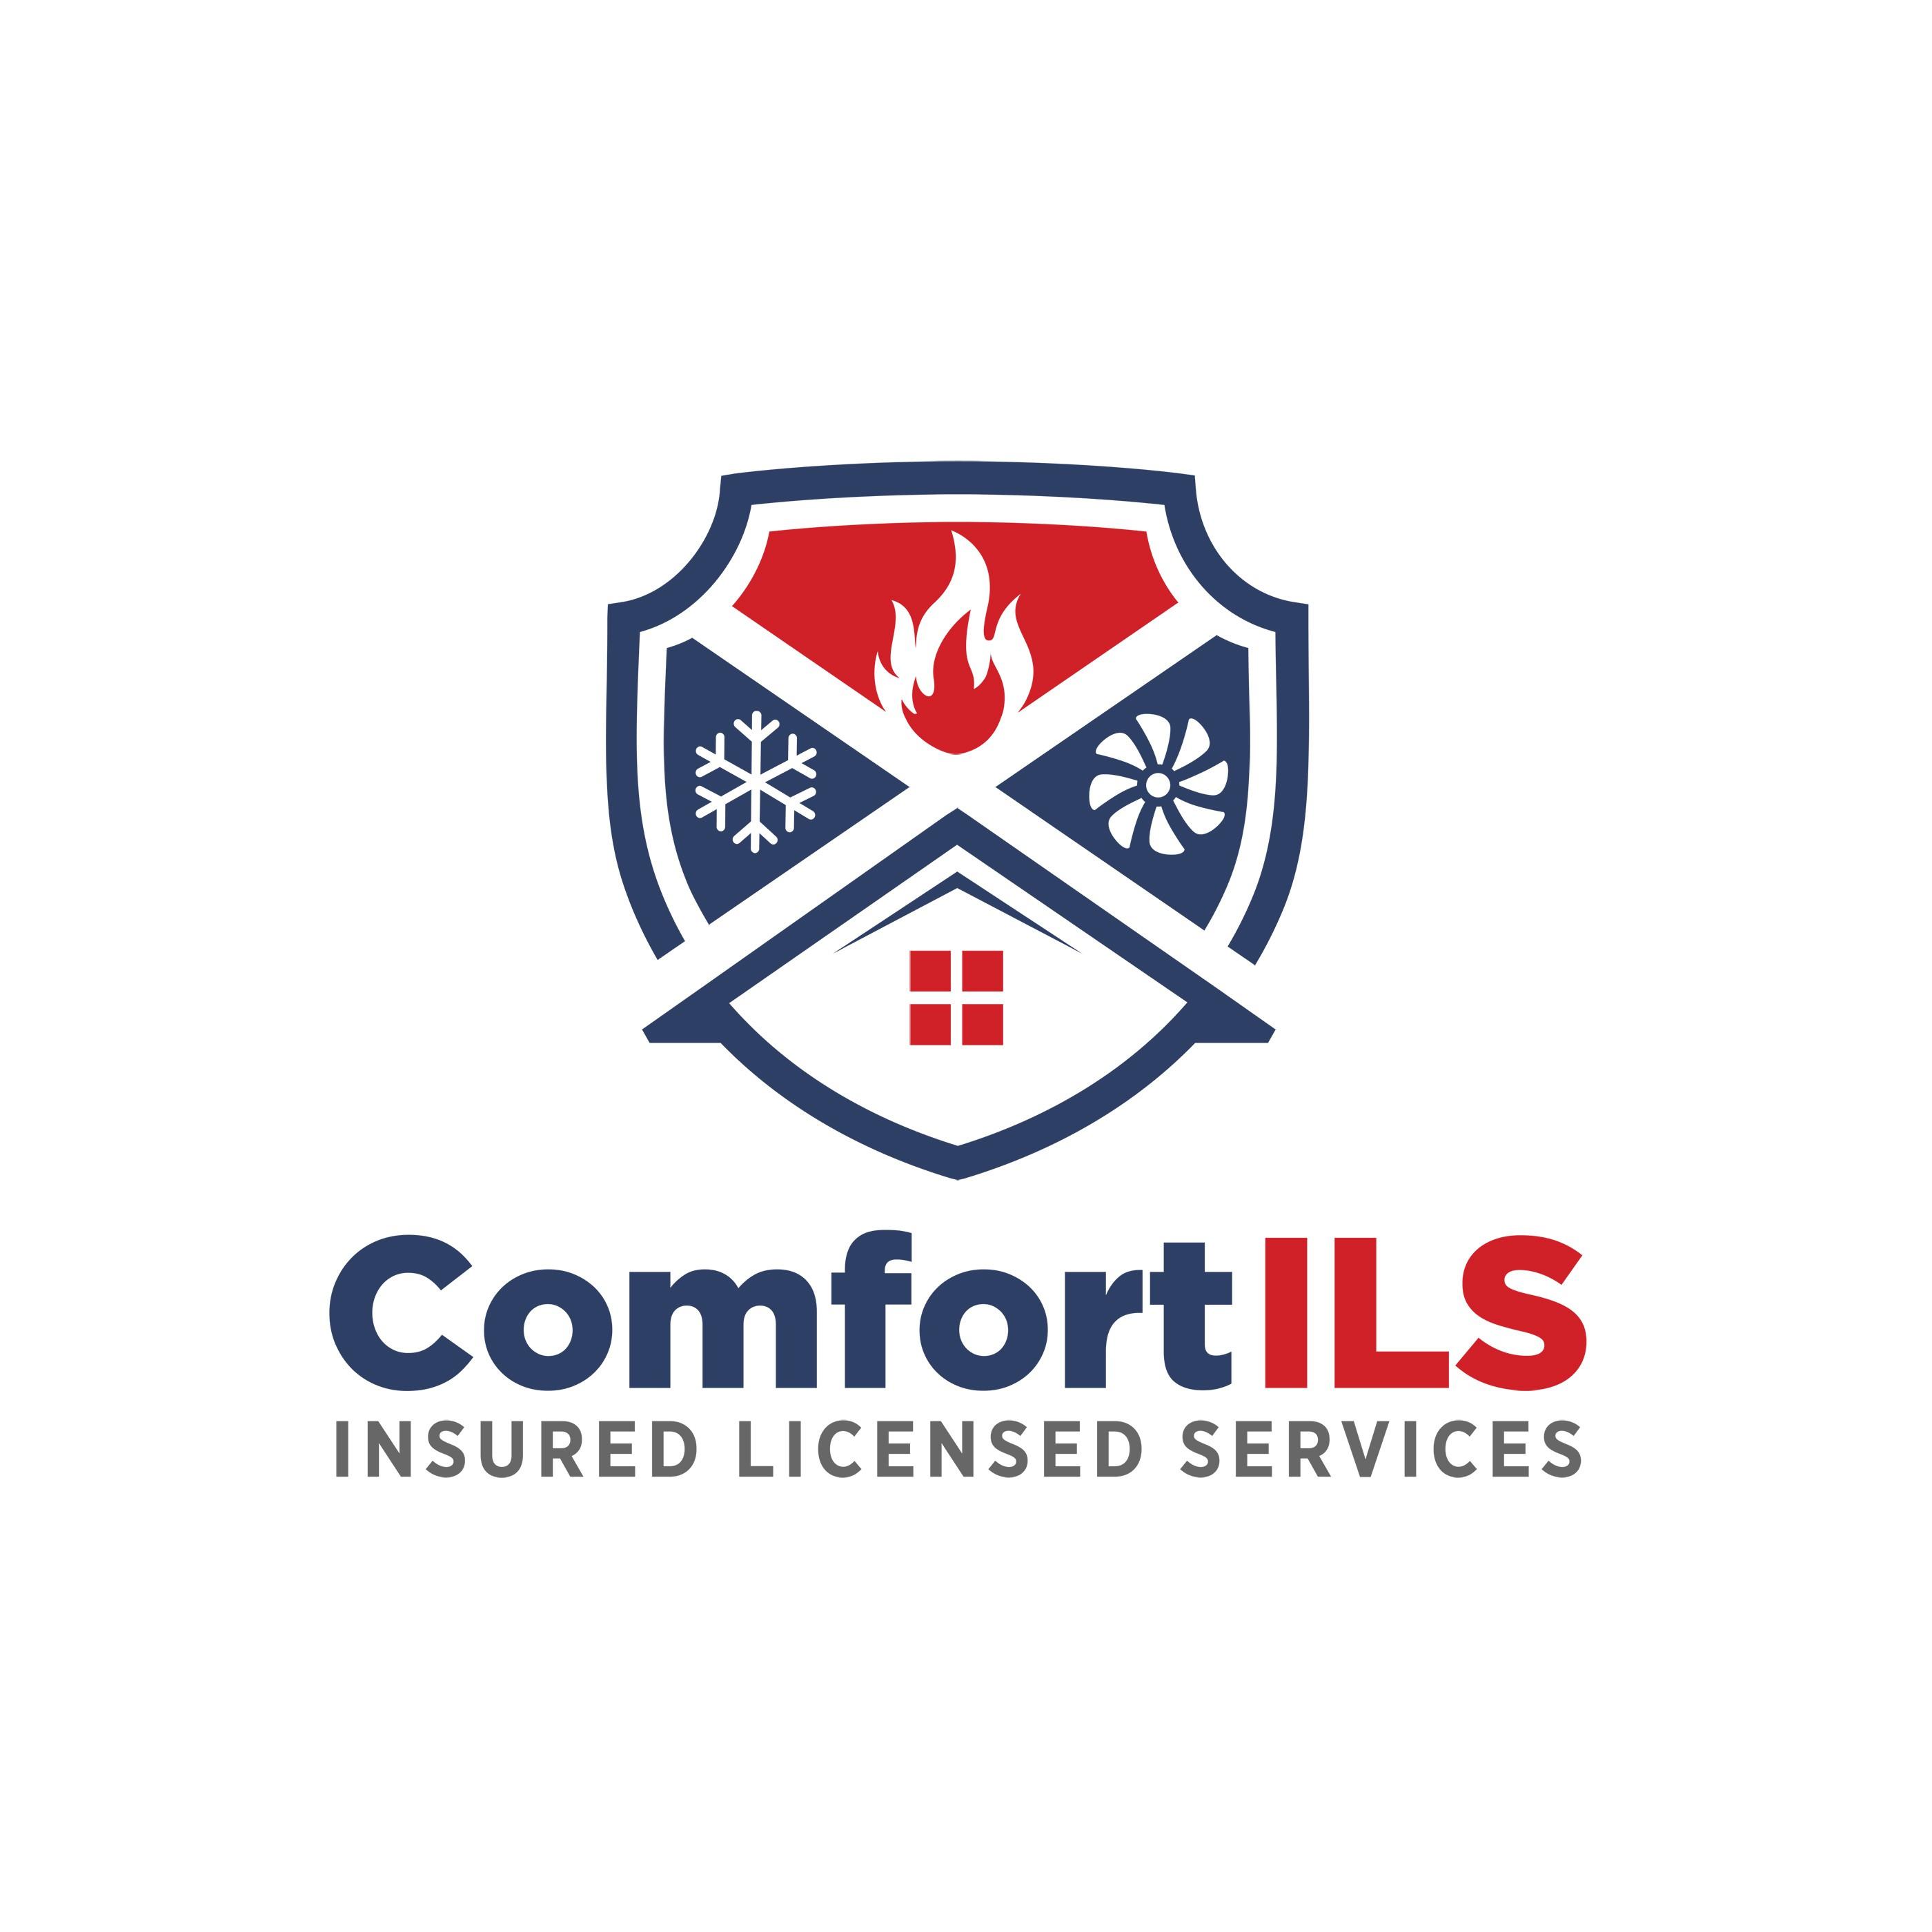 Air conditioning contractor logo